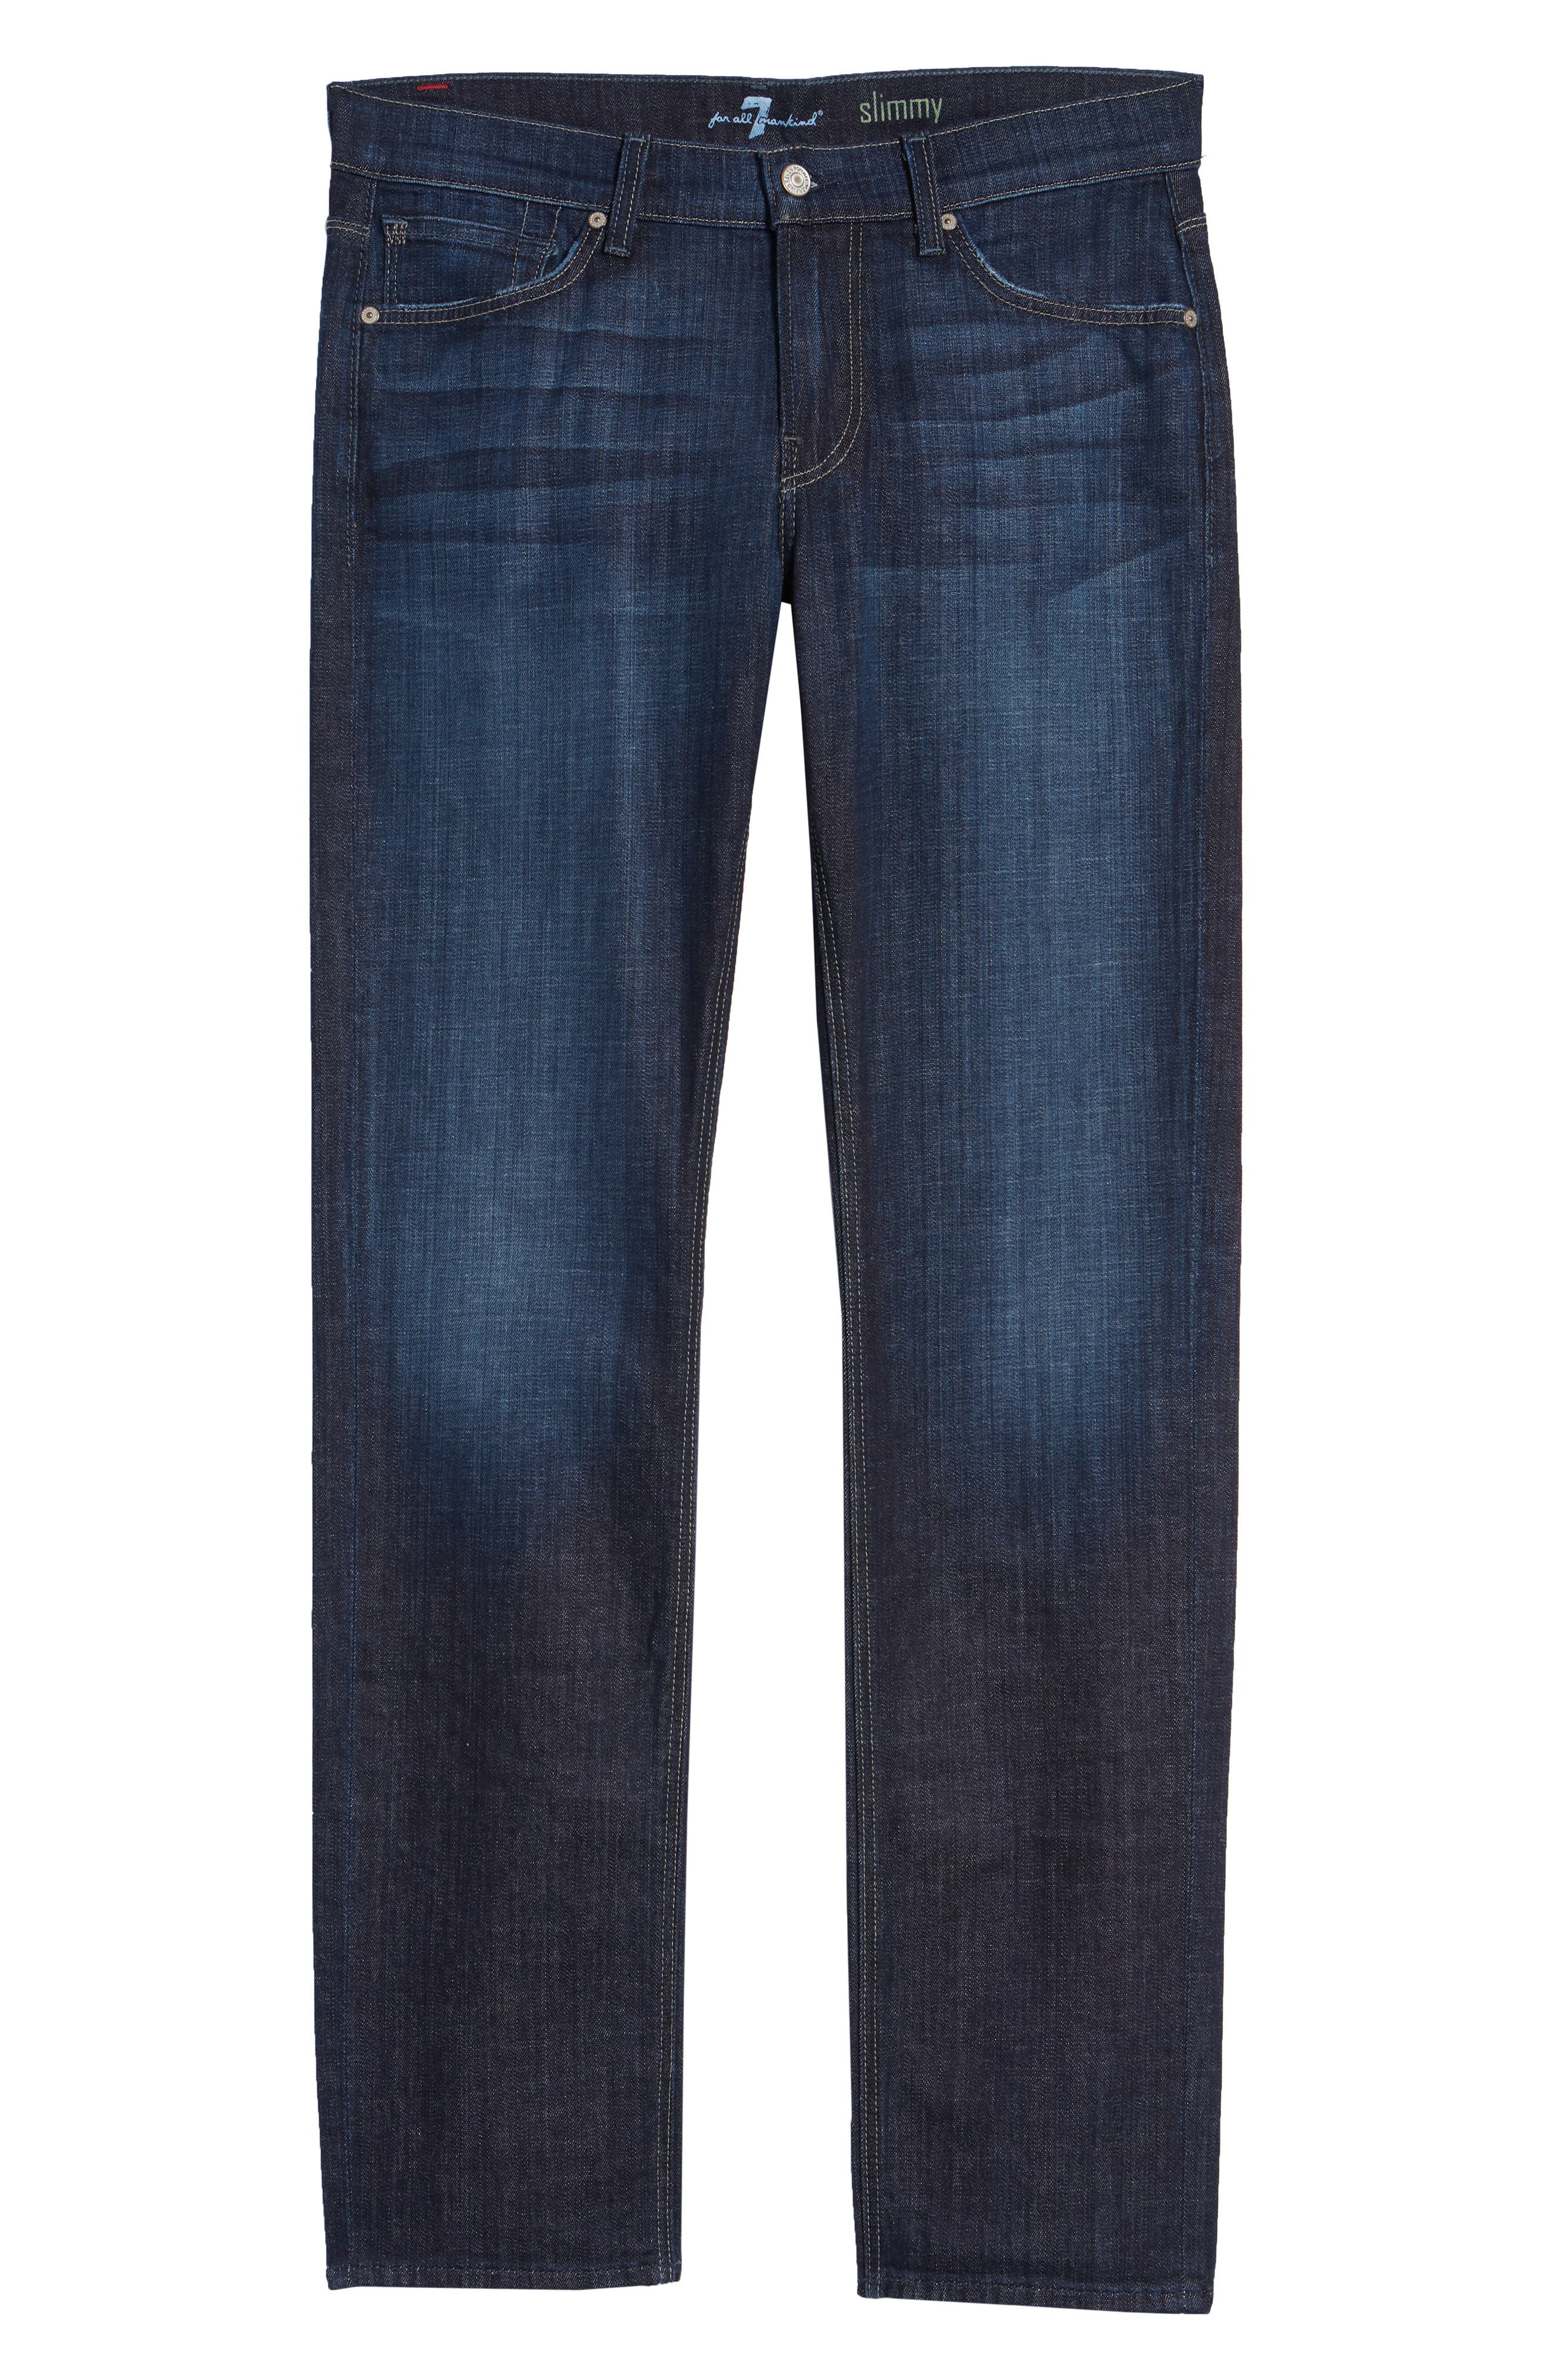 Slimmy Slim Fit Jeans,                             Alternate thumbnail 2, color,                             LOS ANGELES DARK